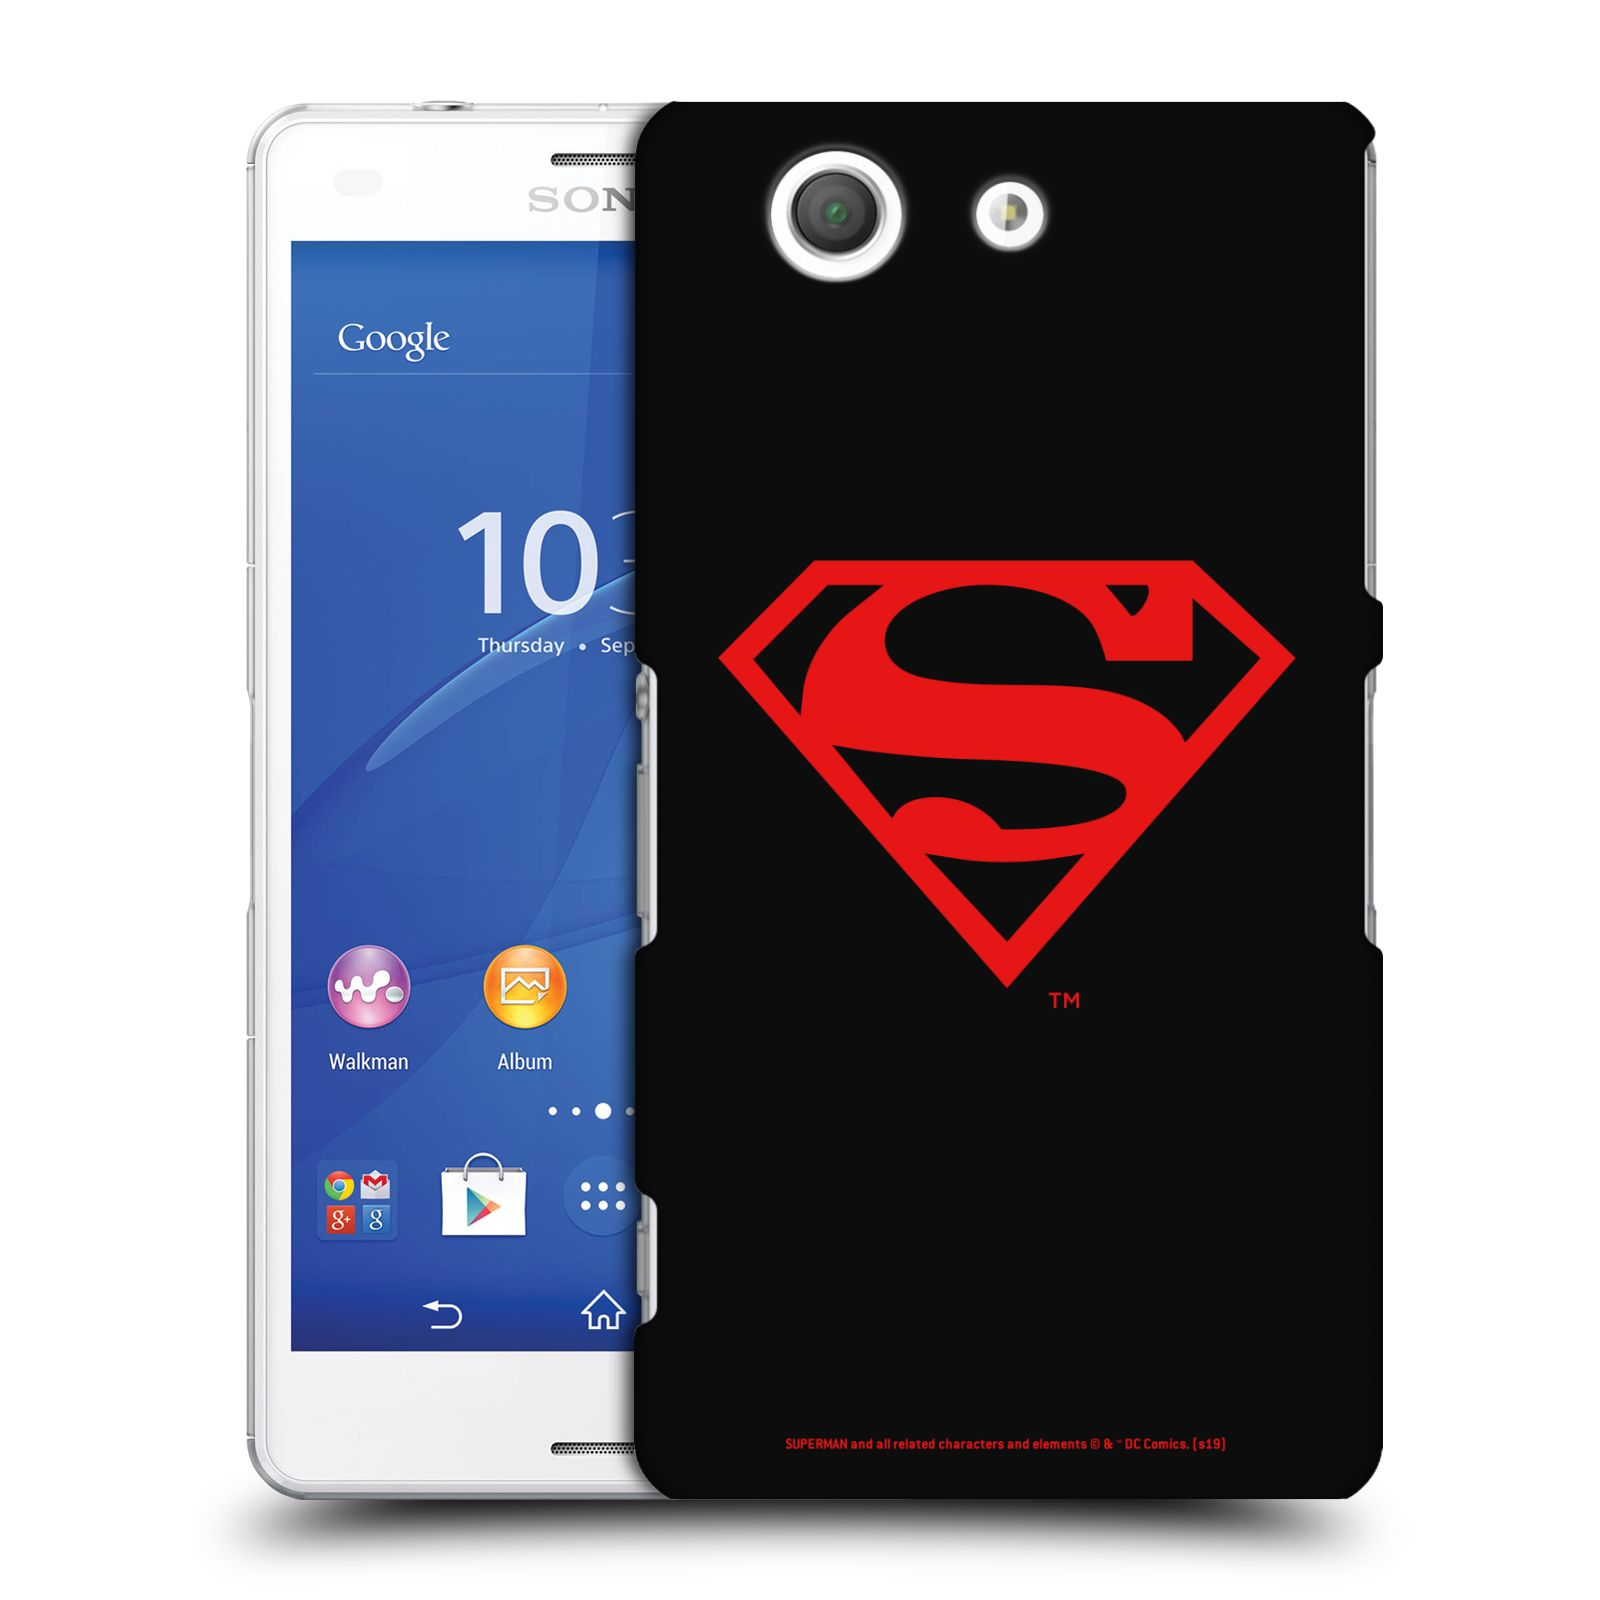 Pouzdro na mobil Sony Xperia Z3 COMPACT - HEAD CASE - DC komix Superman červený znak černé pozadí